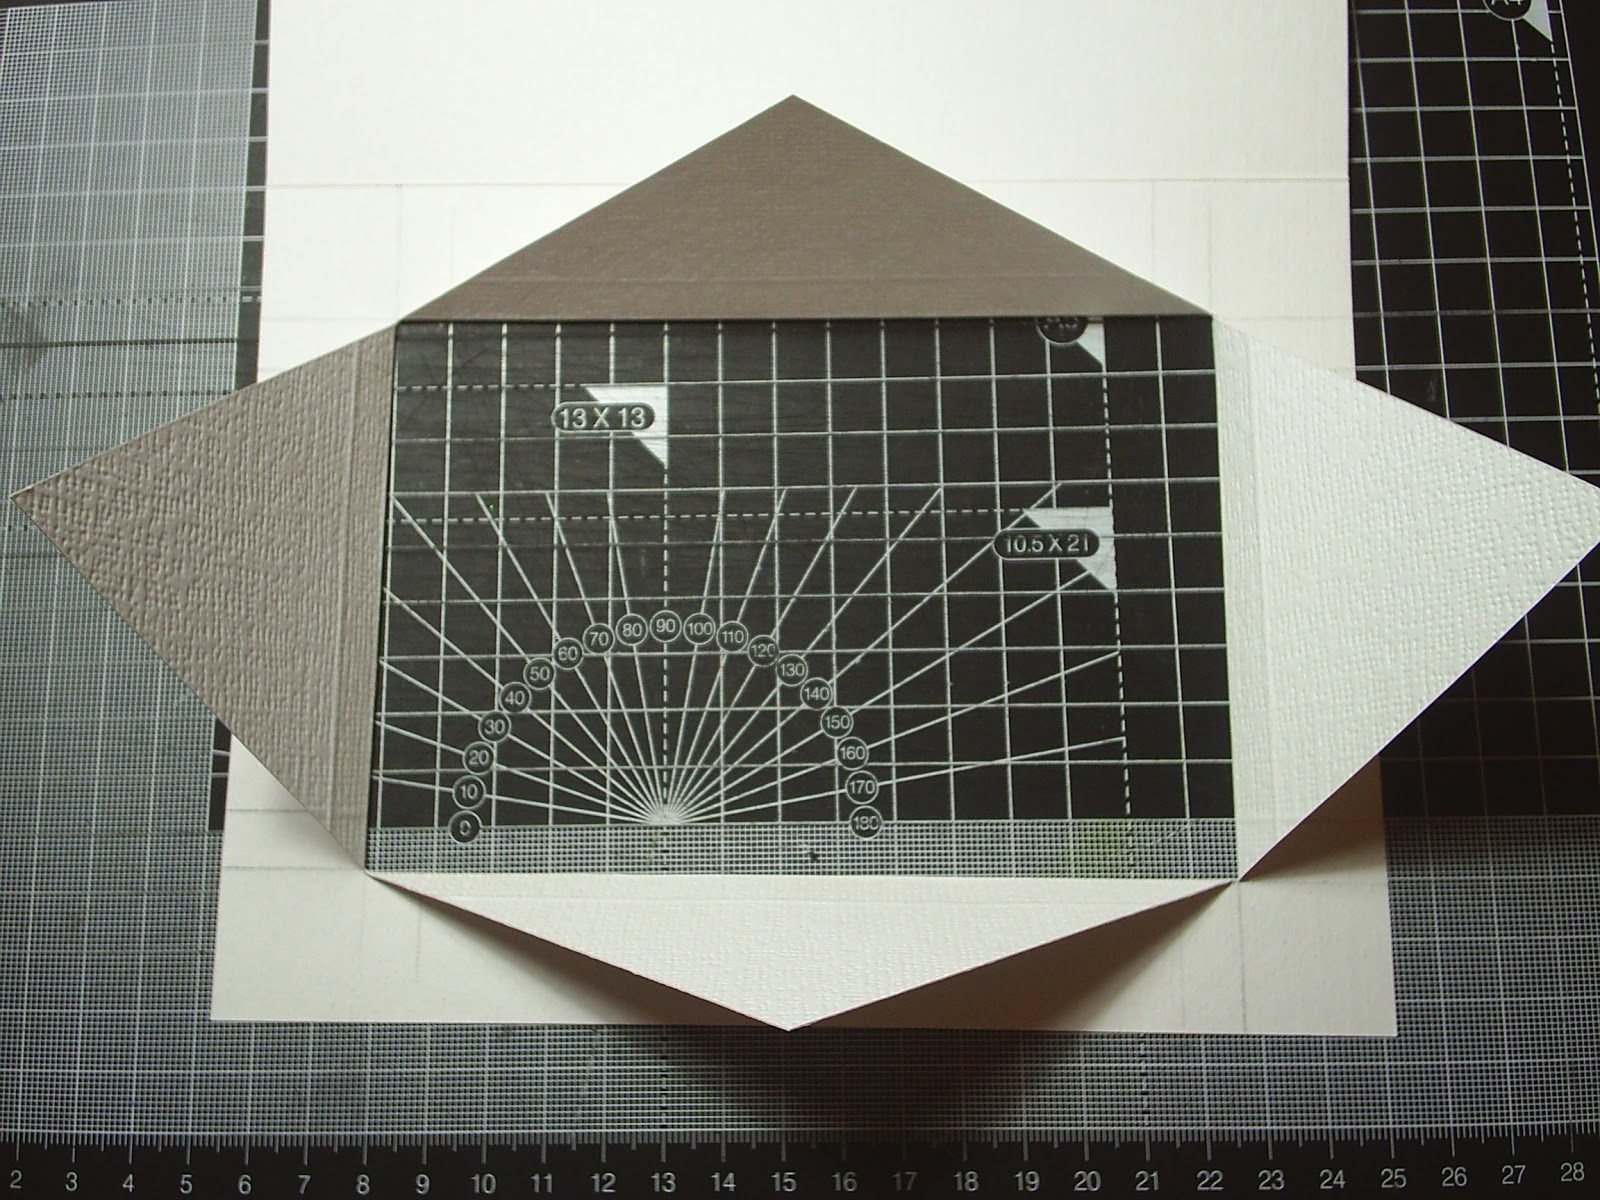 Wallpaper A Window Recess | Free Download Wallpaper | DaWallpaperz